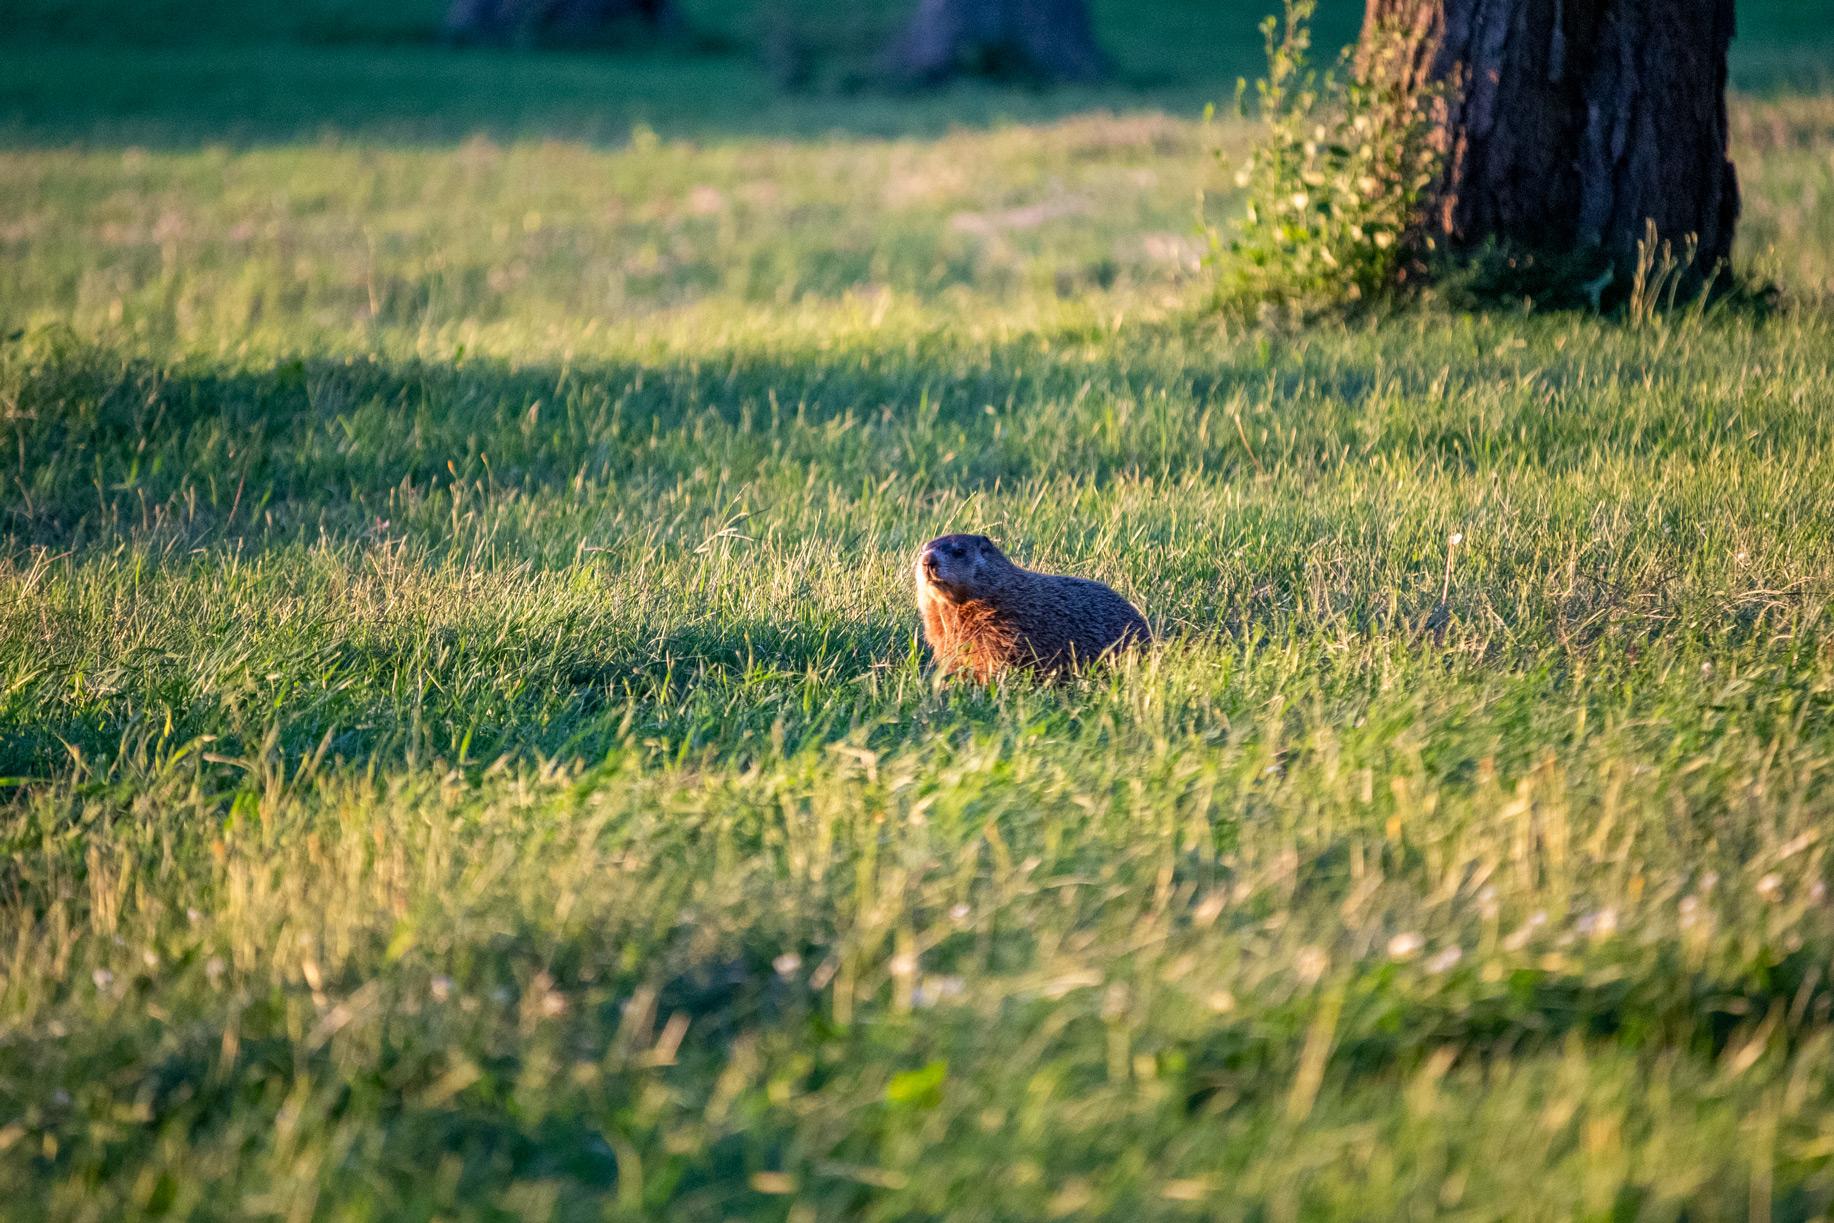 Marmot standing in a grassy field